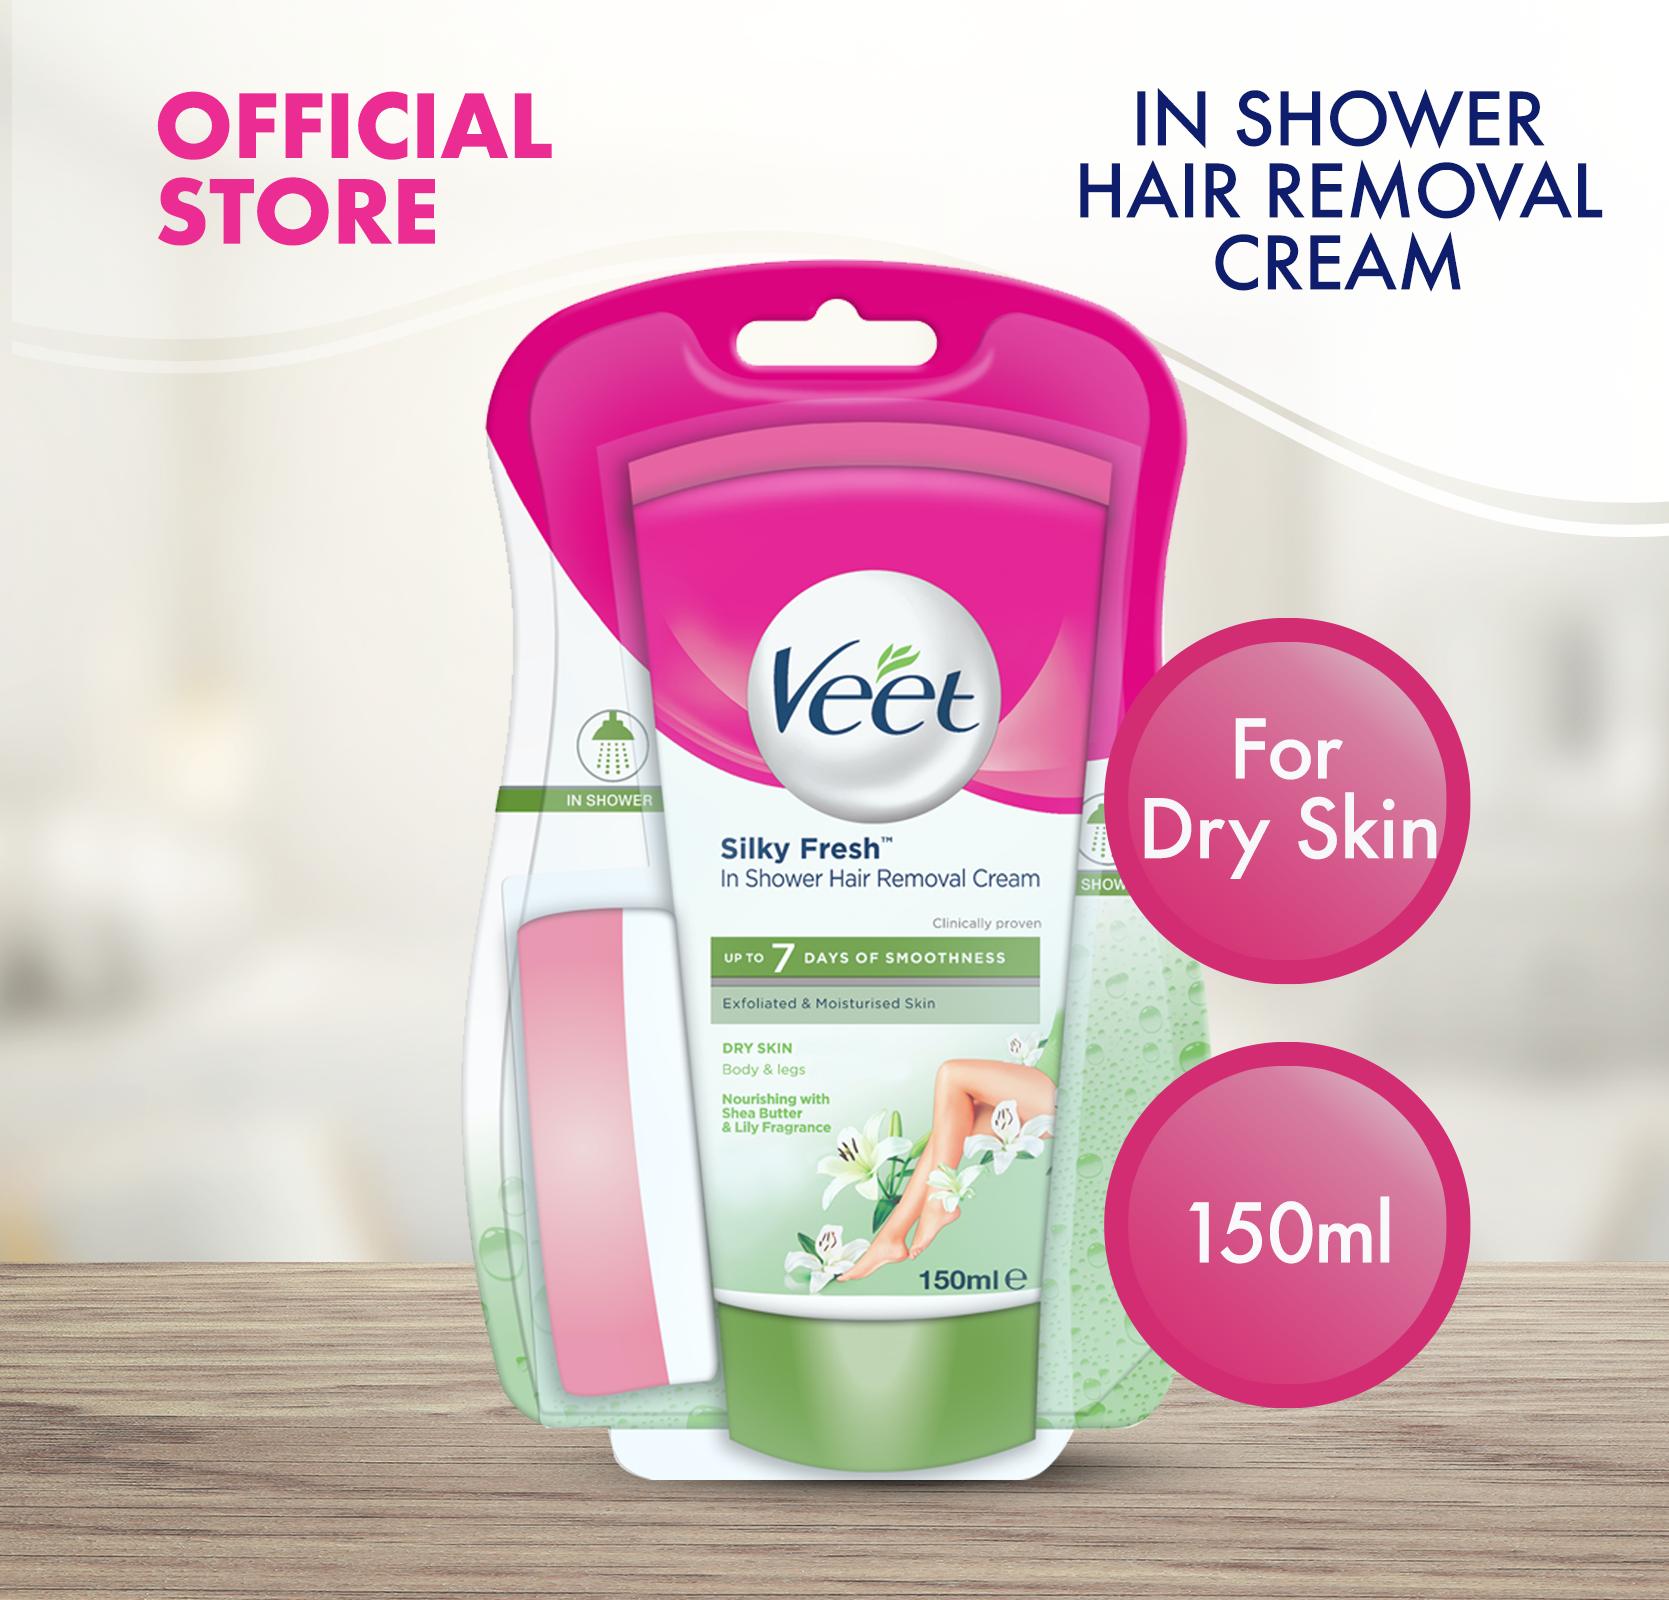 Veet In Shower Hair Removal Cream For Dry Skin 150ml Lazada